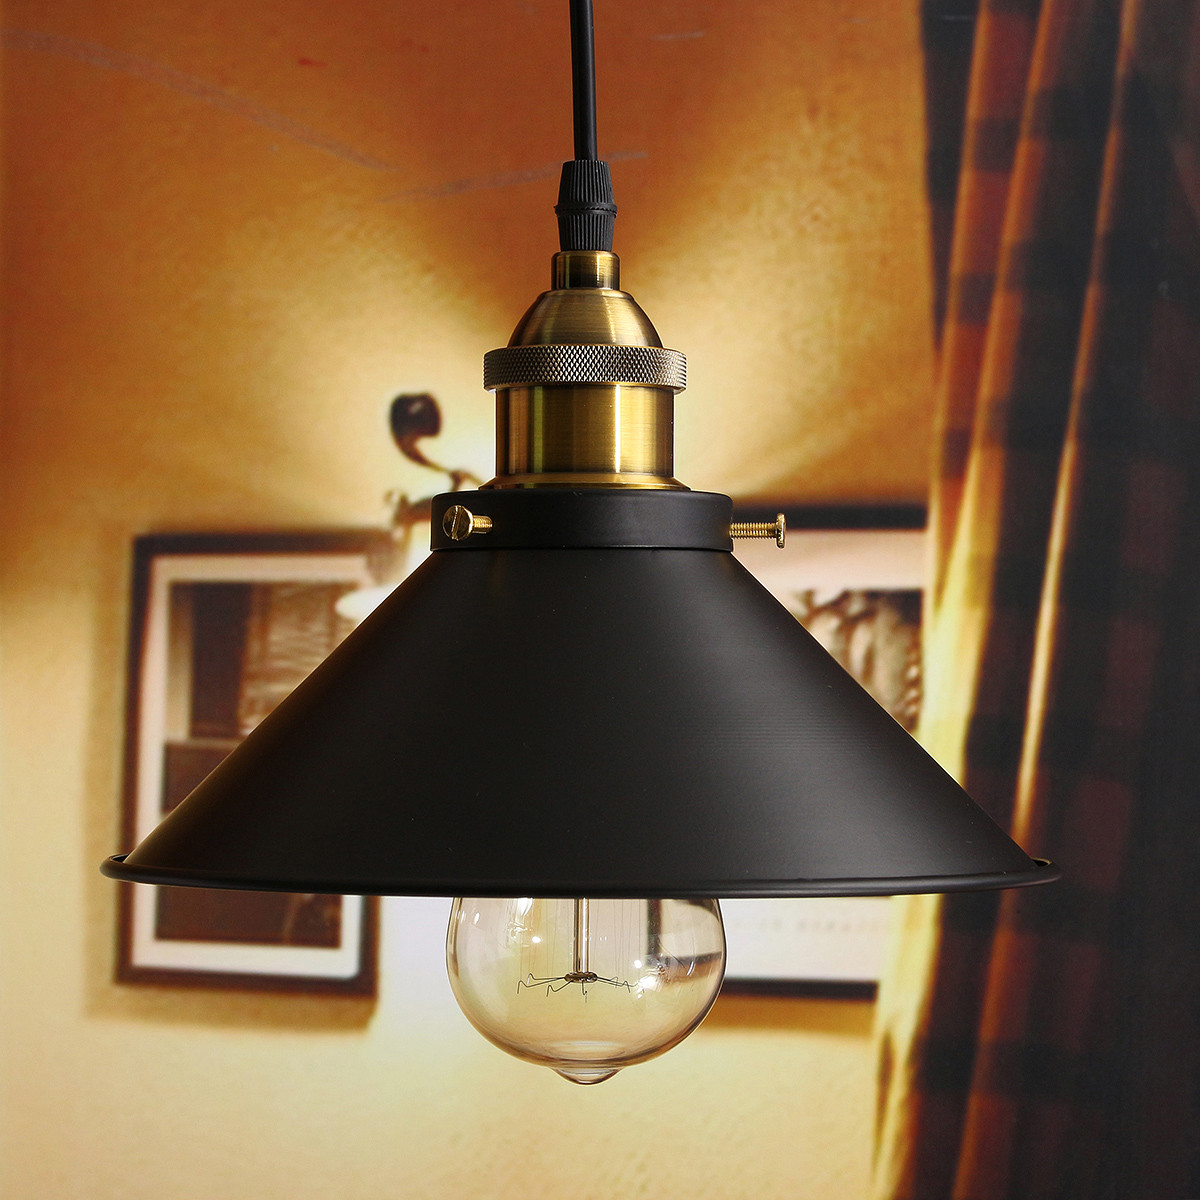 Retro Industrial Sconce Mini Adjustable Vintage Edison Simplicity Wall Lamp/Ceiling Light Loft Style Antique Lampshade Ambilight